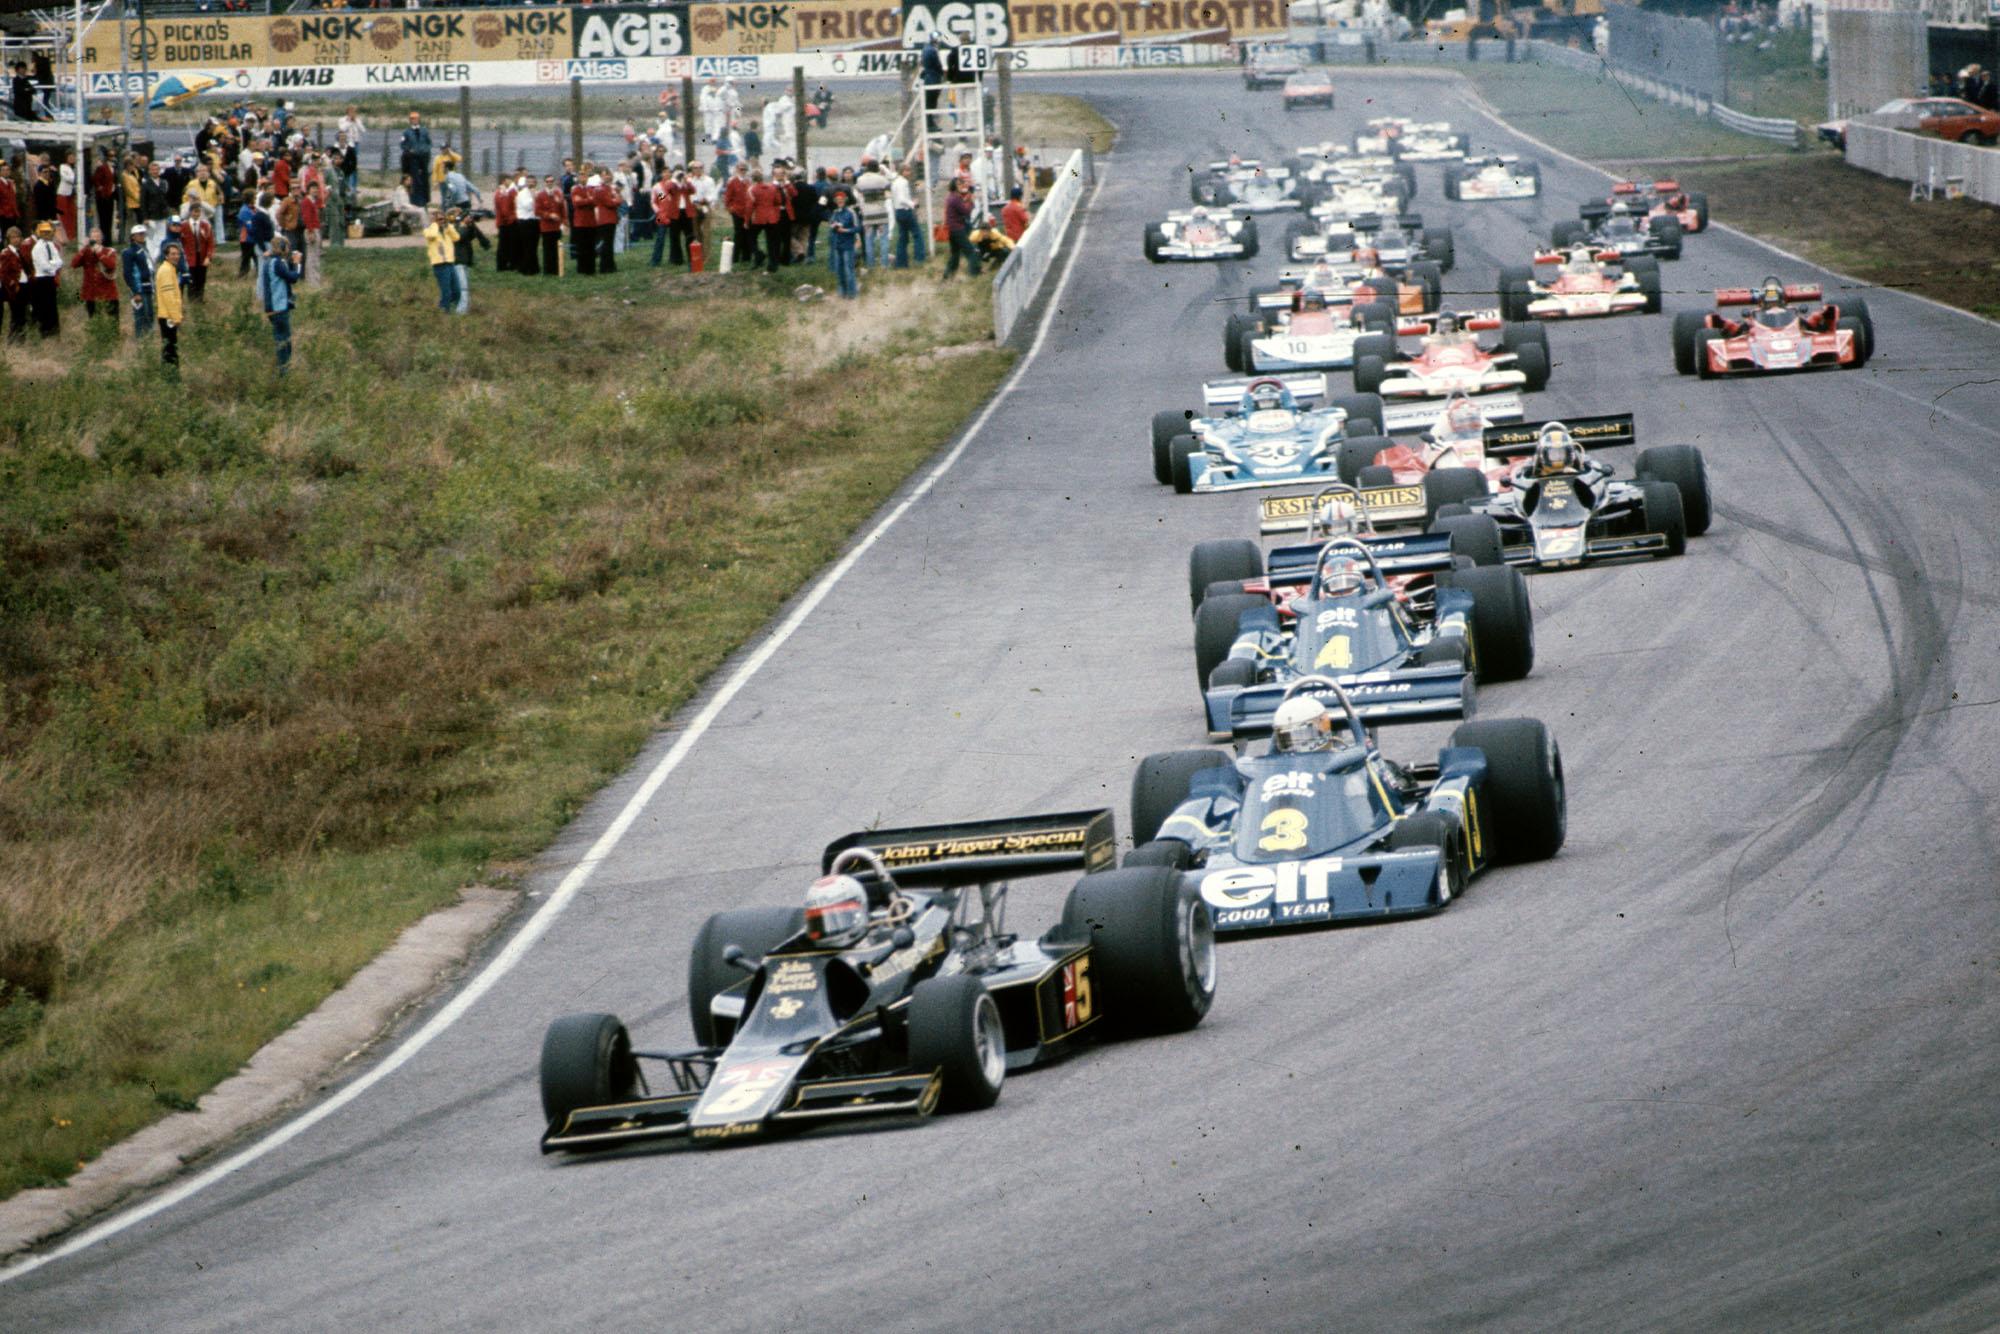 Mario Andretti (Lotus) leads at the start of the 1976 Swedish Grand Prix.